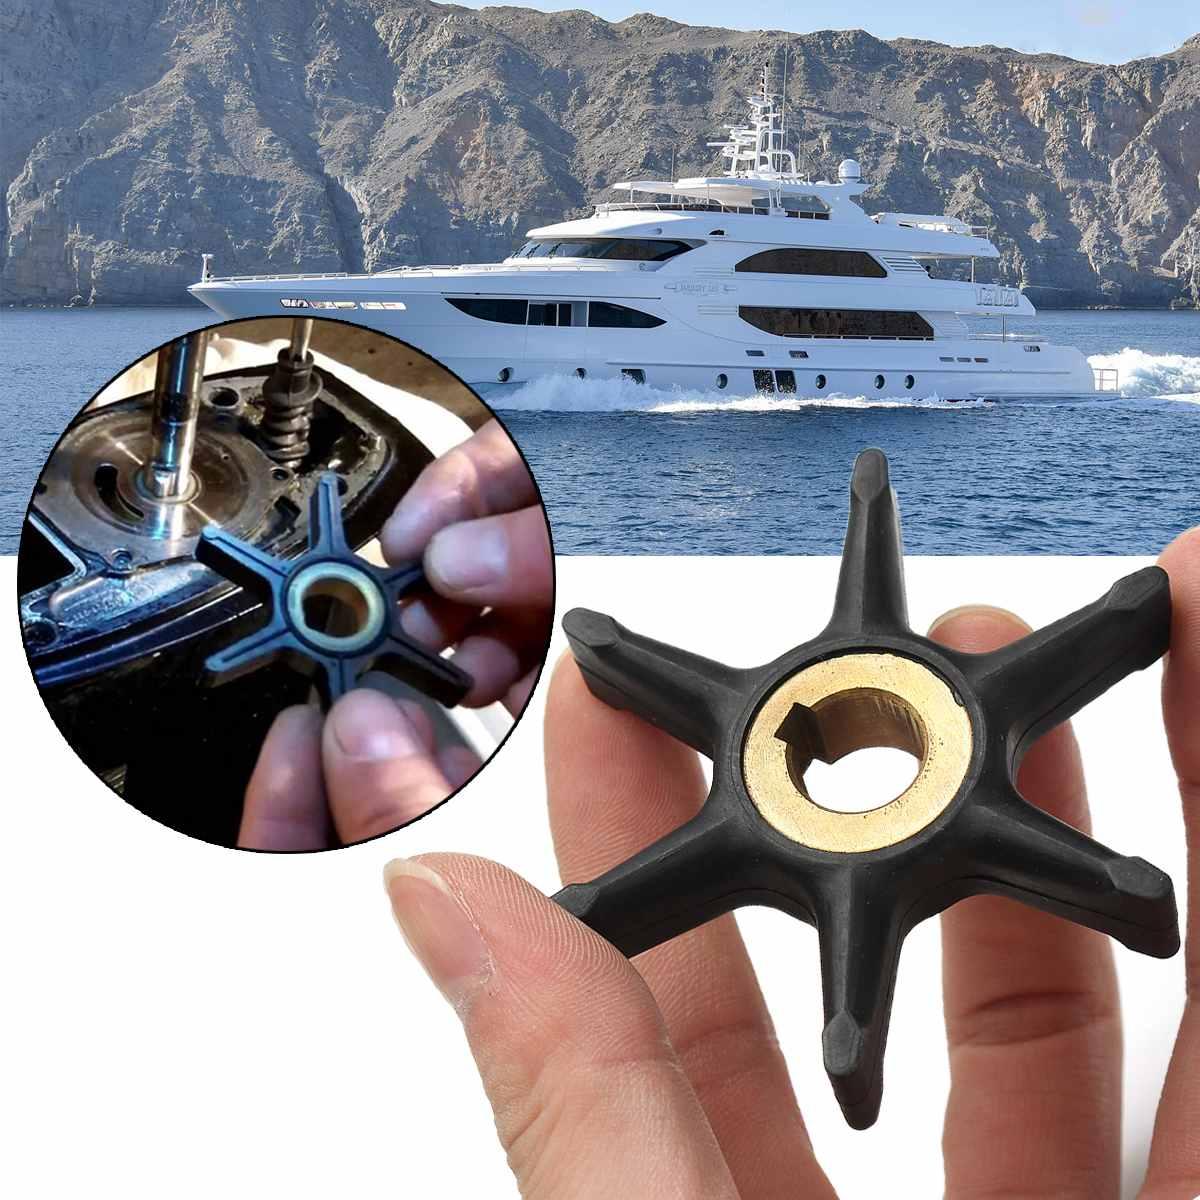 6.8cm Diameter For Johnson Evinrude Water Pump Impeller 10/15/18/20/25HP Outboard Motor 375638 Rubber Water Pump Impeller